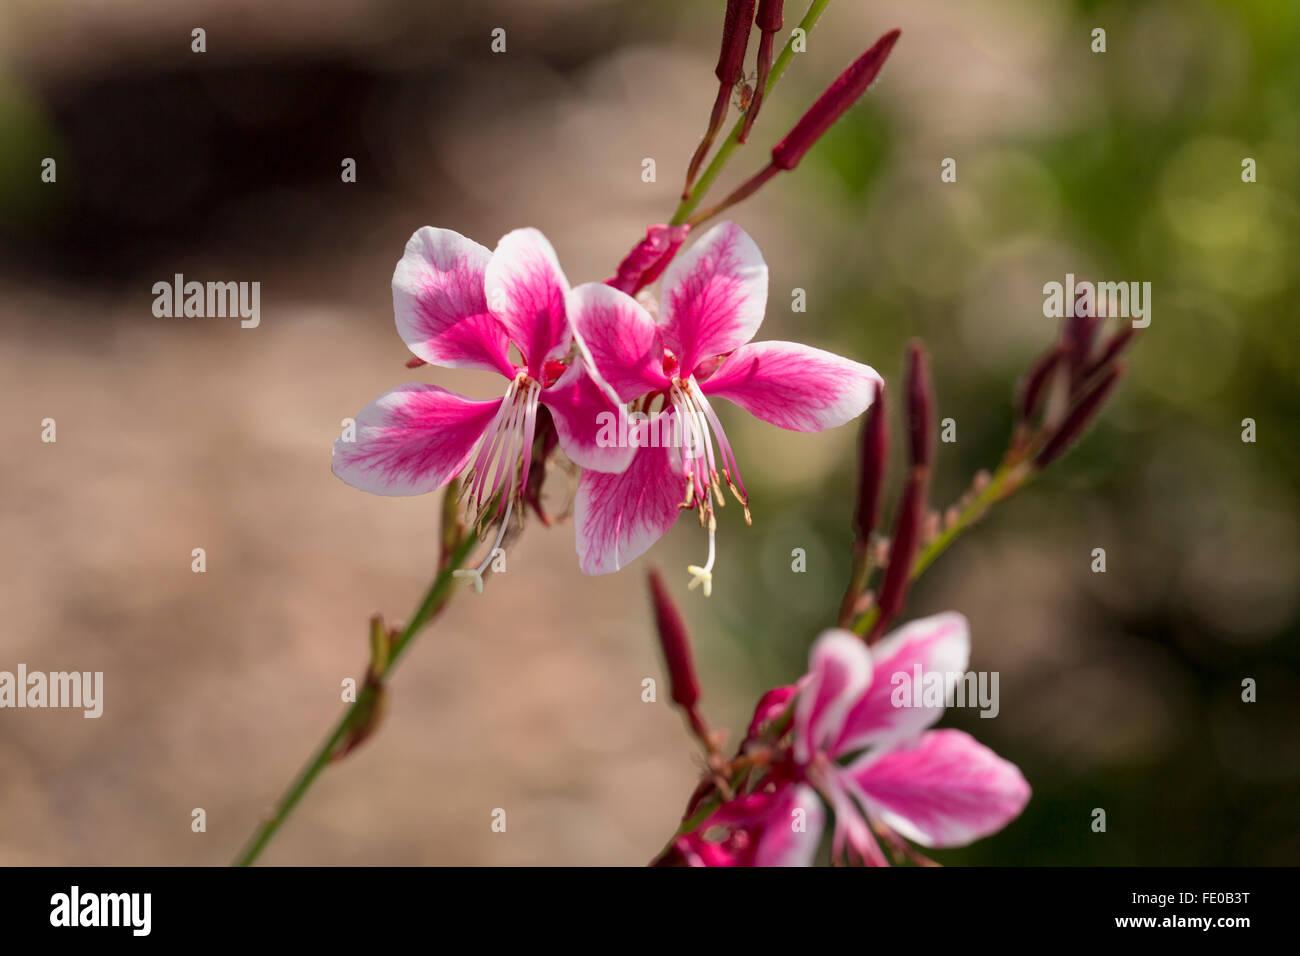 Whirling Butterflies, Gaura lindheimeri Siskiyou Pink - Stock Image